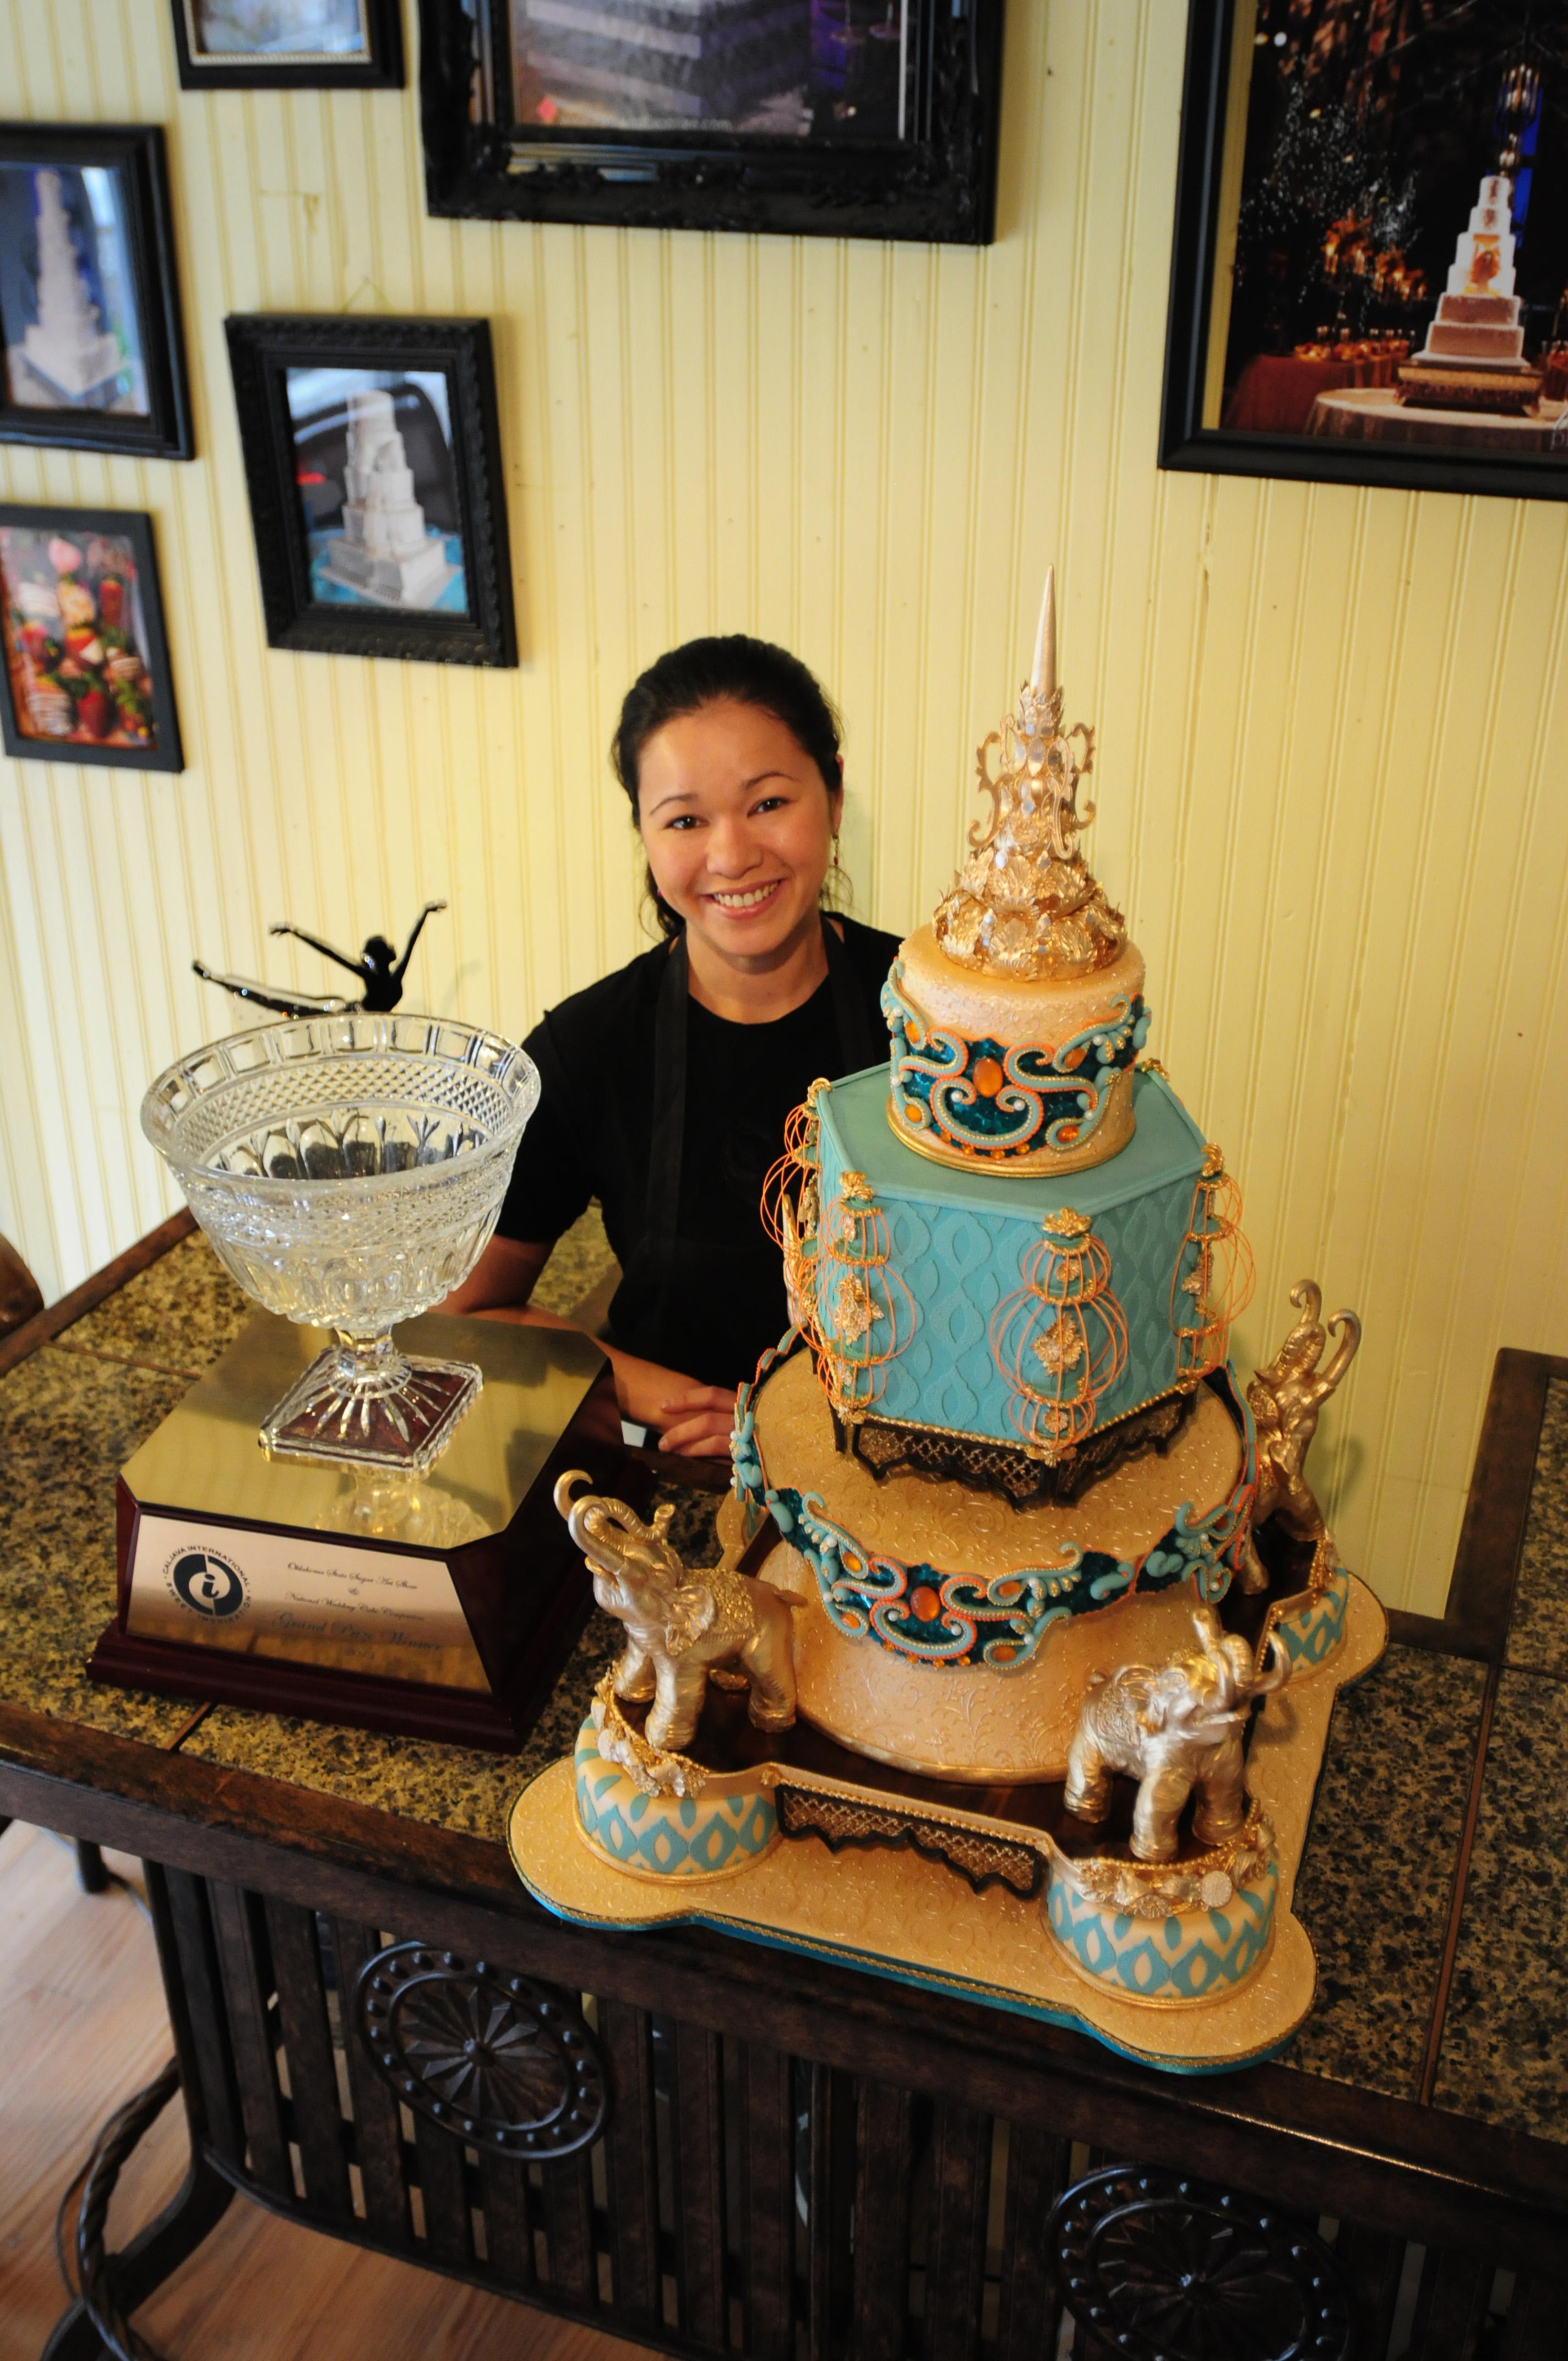 Artisan takes the cake | NWADG